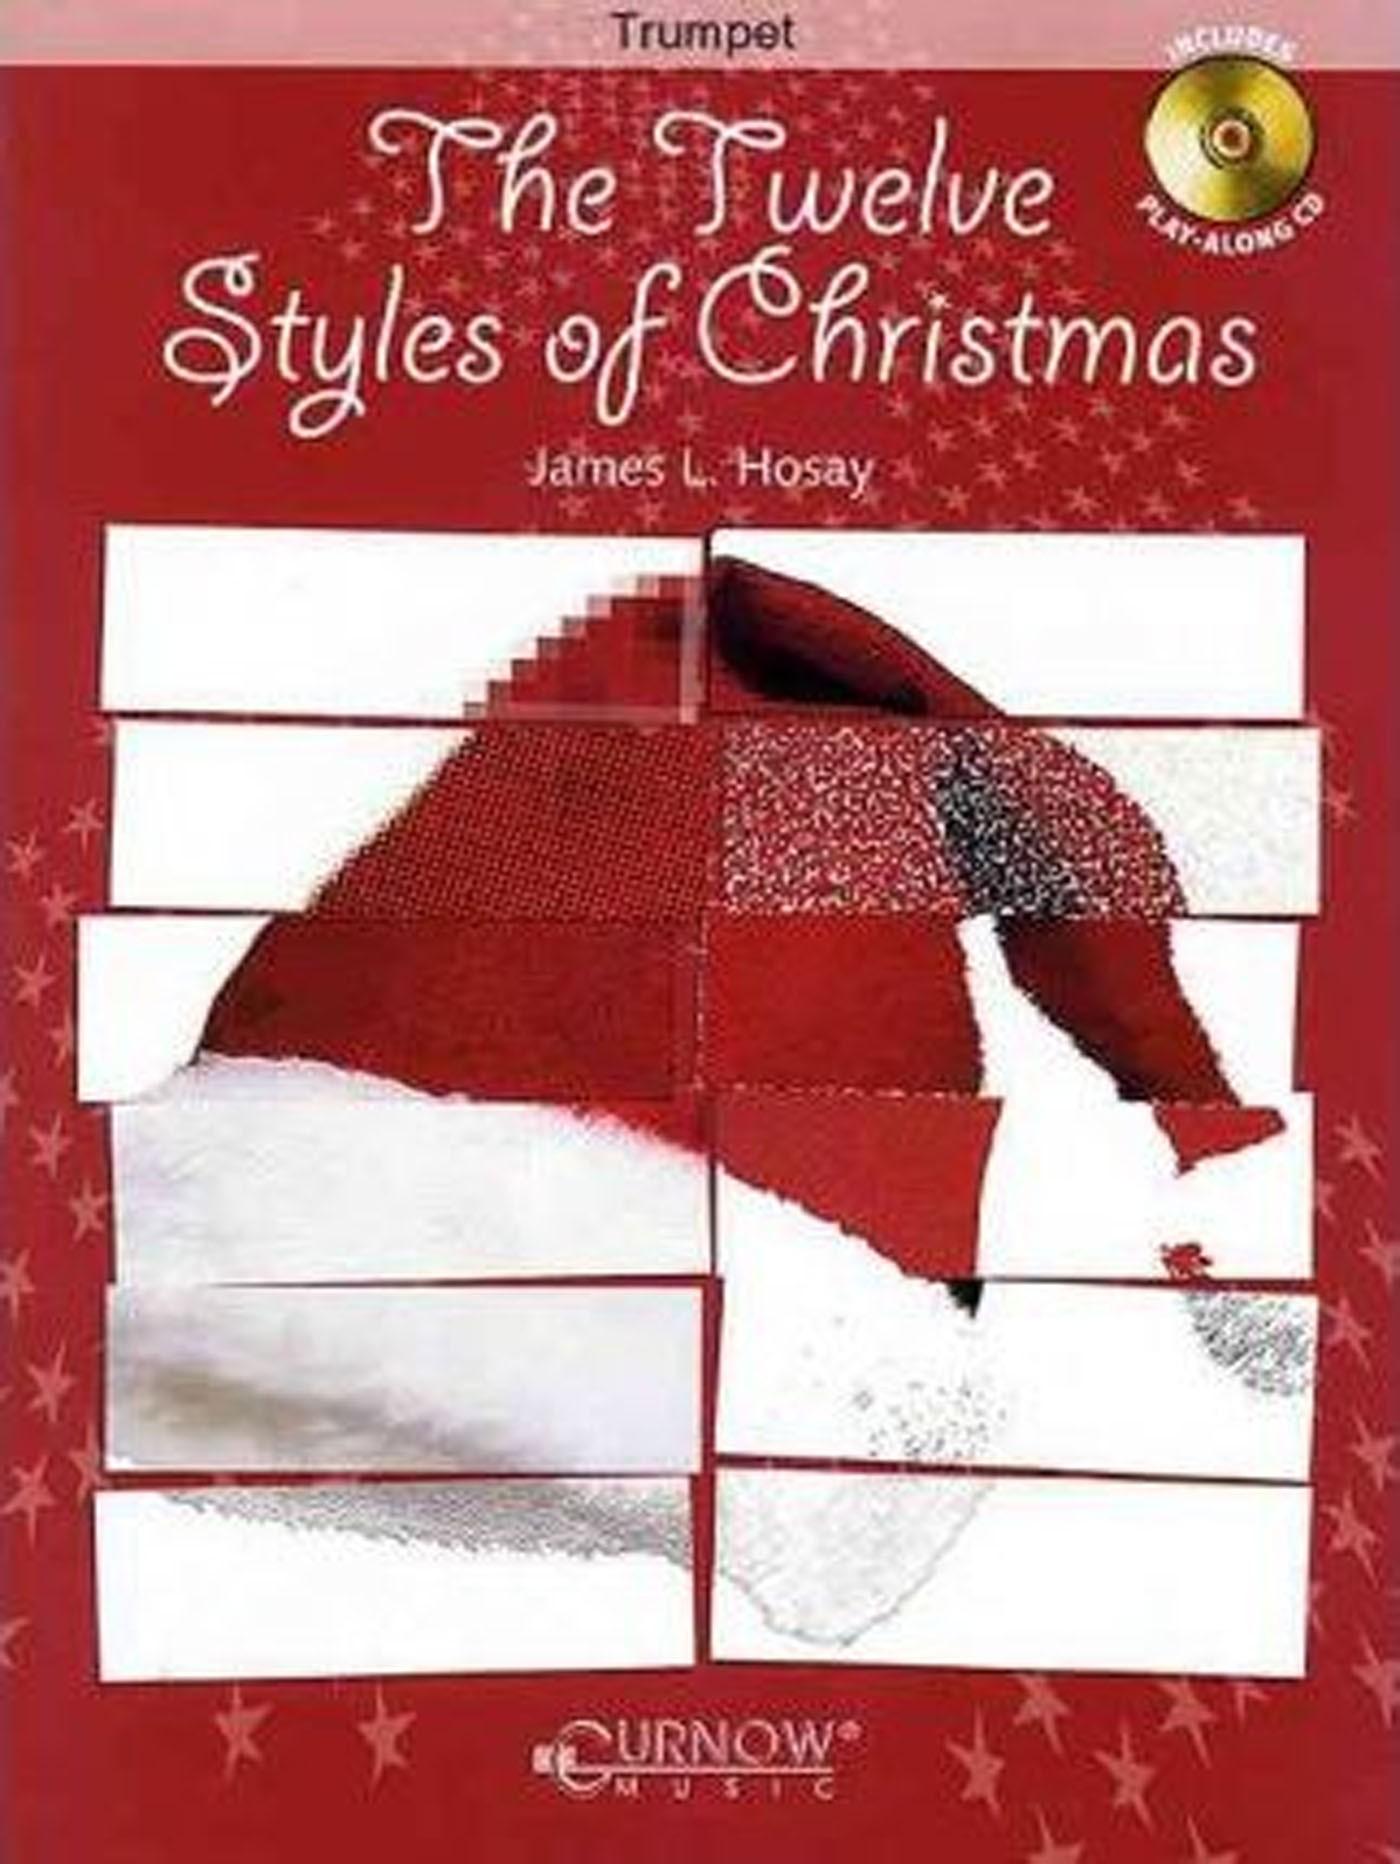 The Twelve Styles Of Christmas Trumpet Book & CD James Hosay Grades 2-3 S147